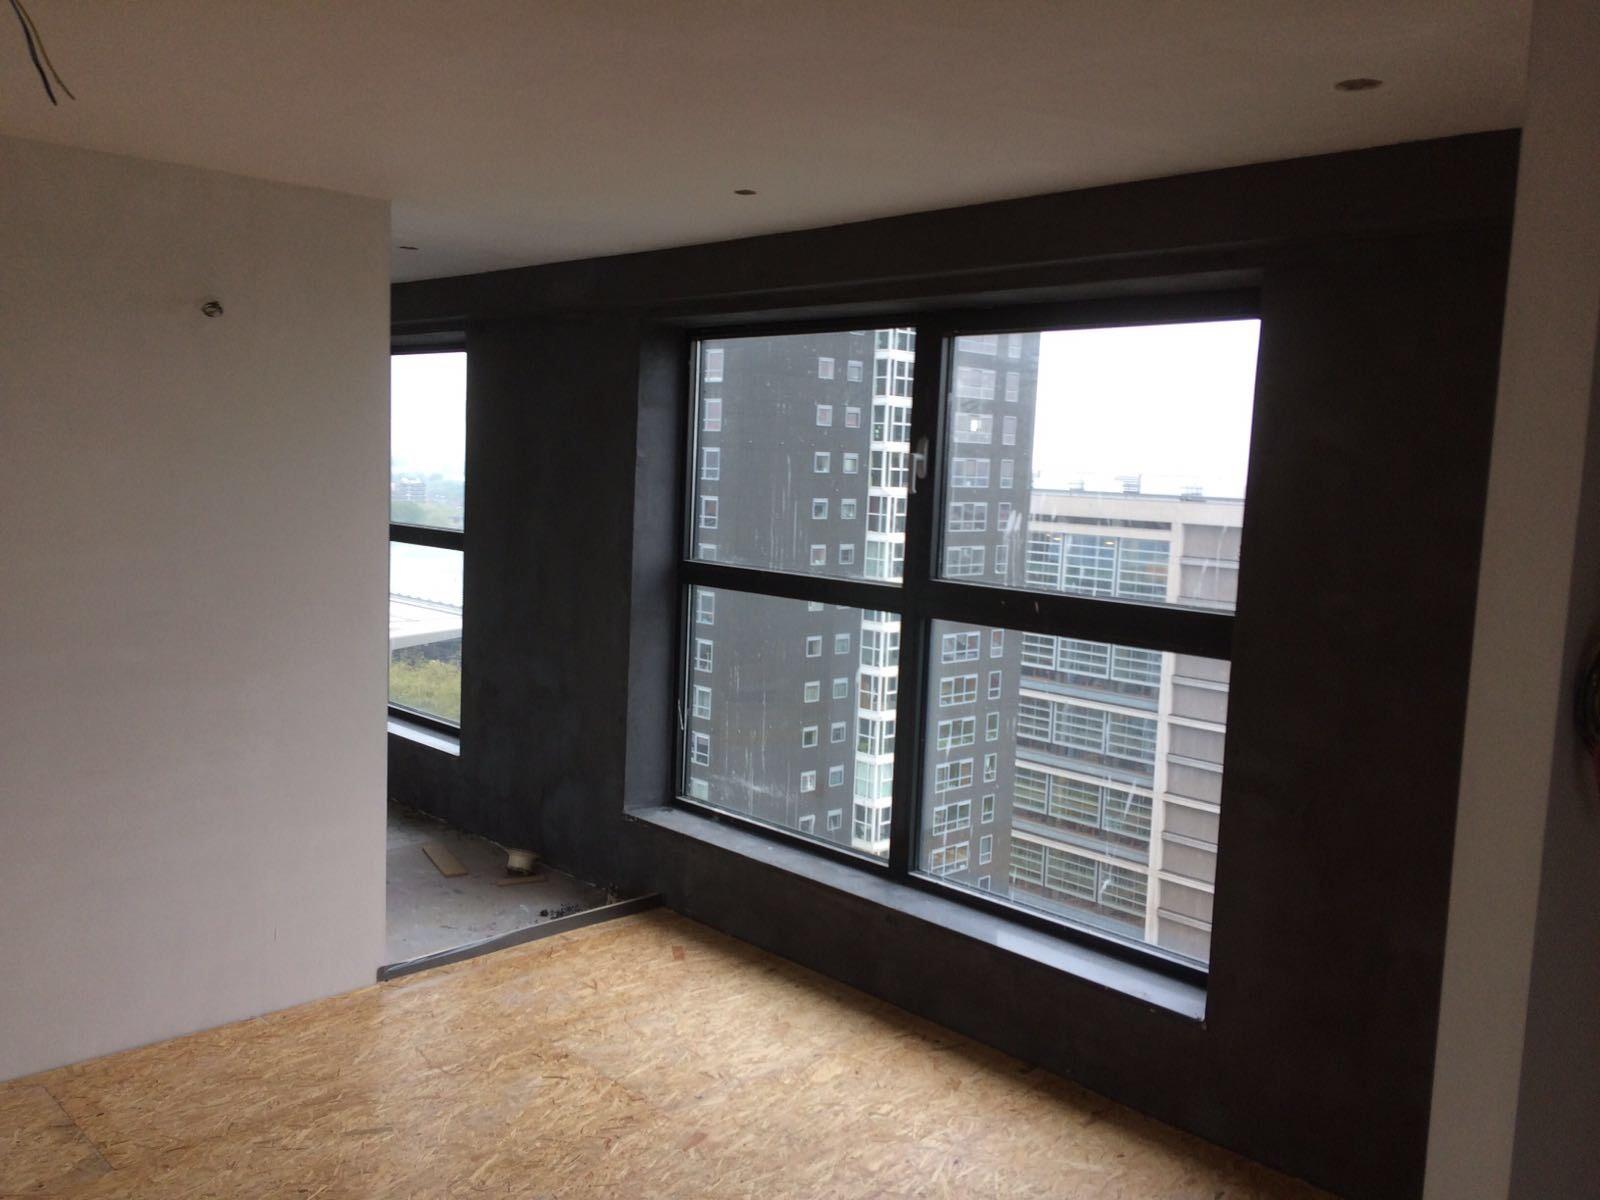 leef beton rotterdam betonlook wanden en vloer in penthouse